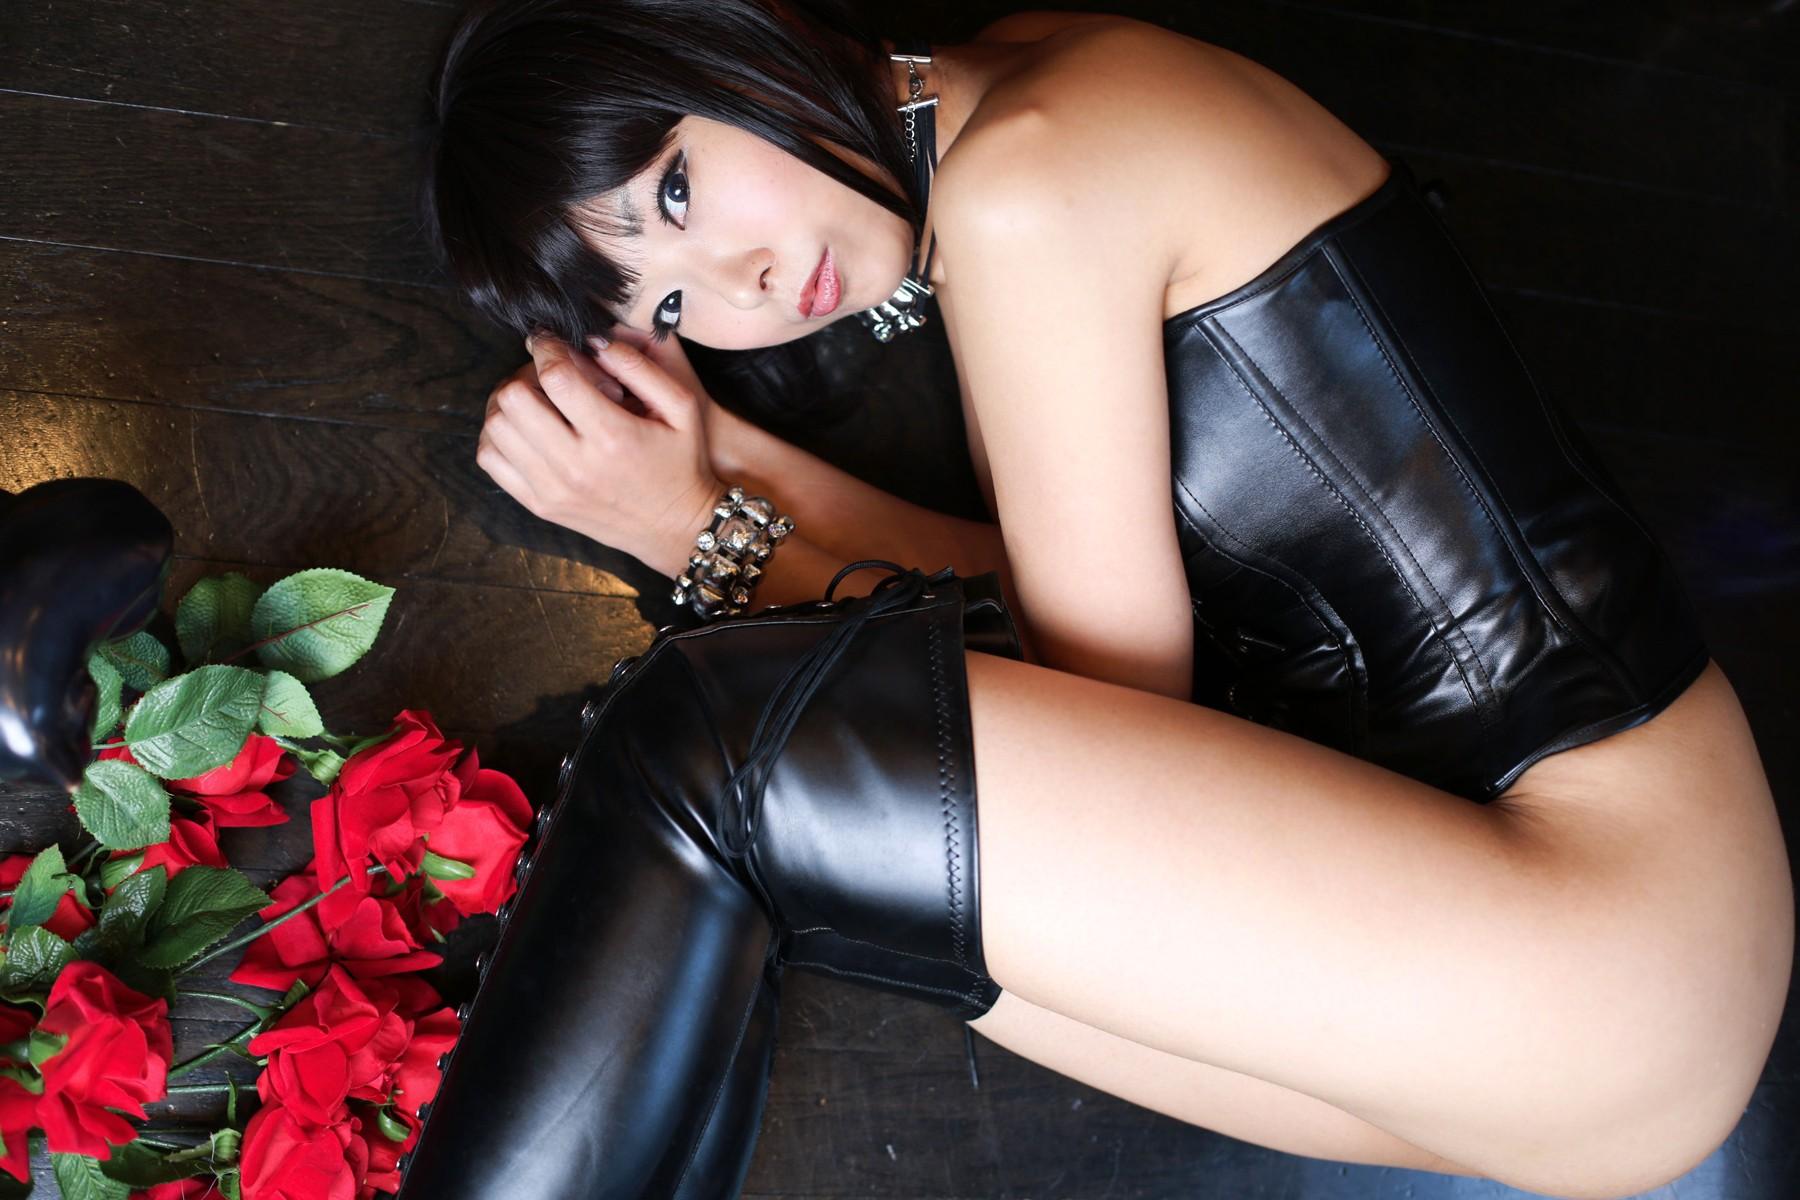 Girls naked leather, asian sex blogspot